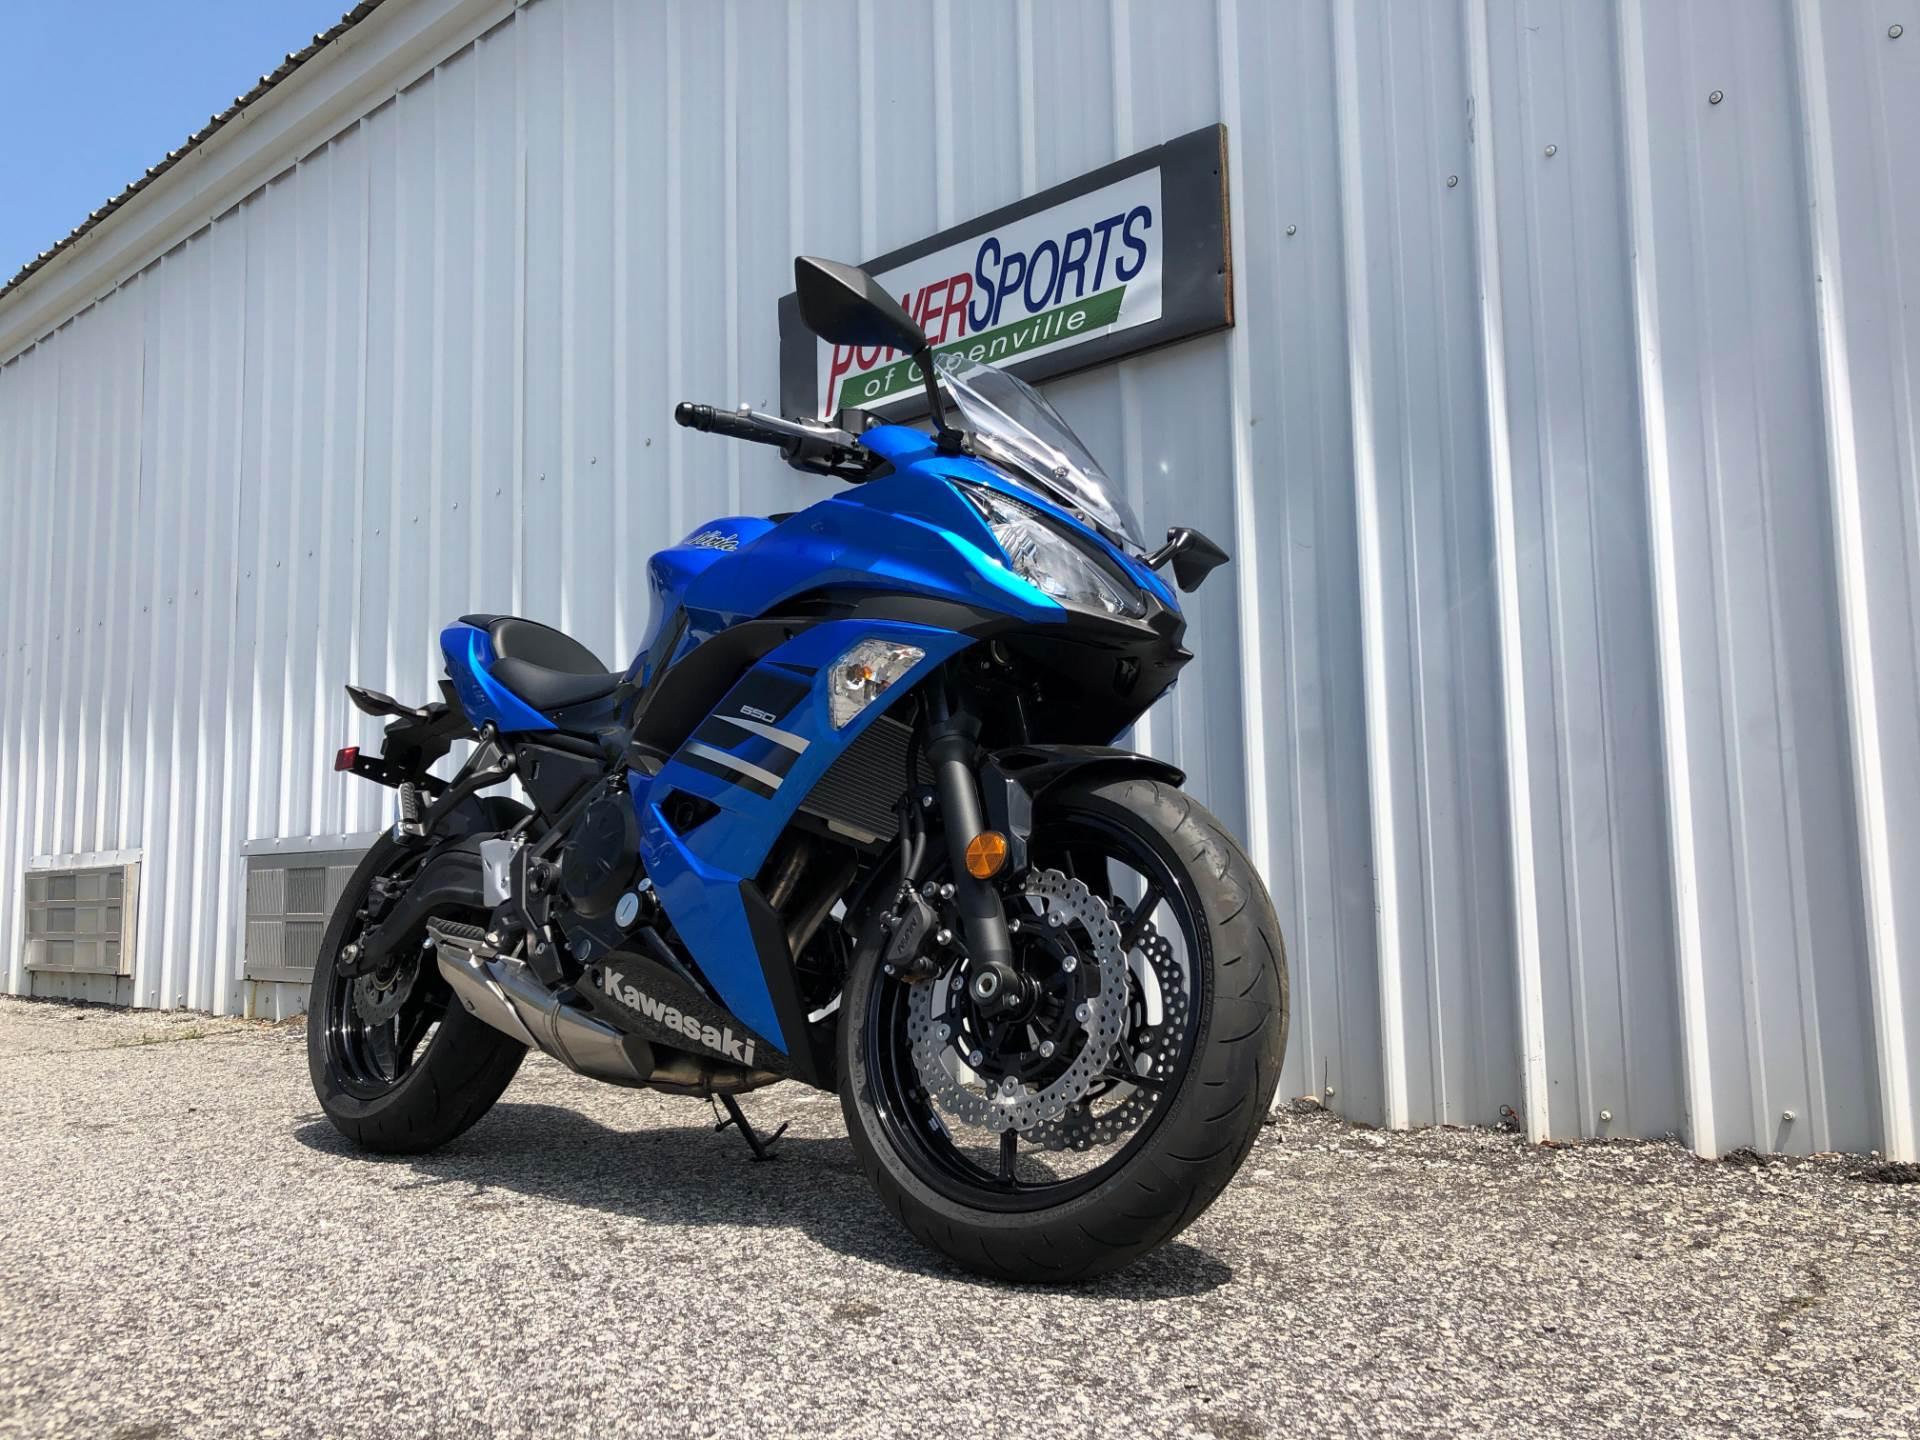 2018 Kawasaki Ninja 650 In Greenville South Carolina